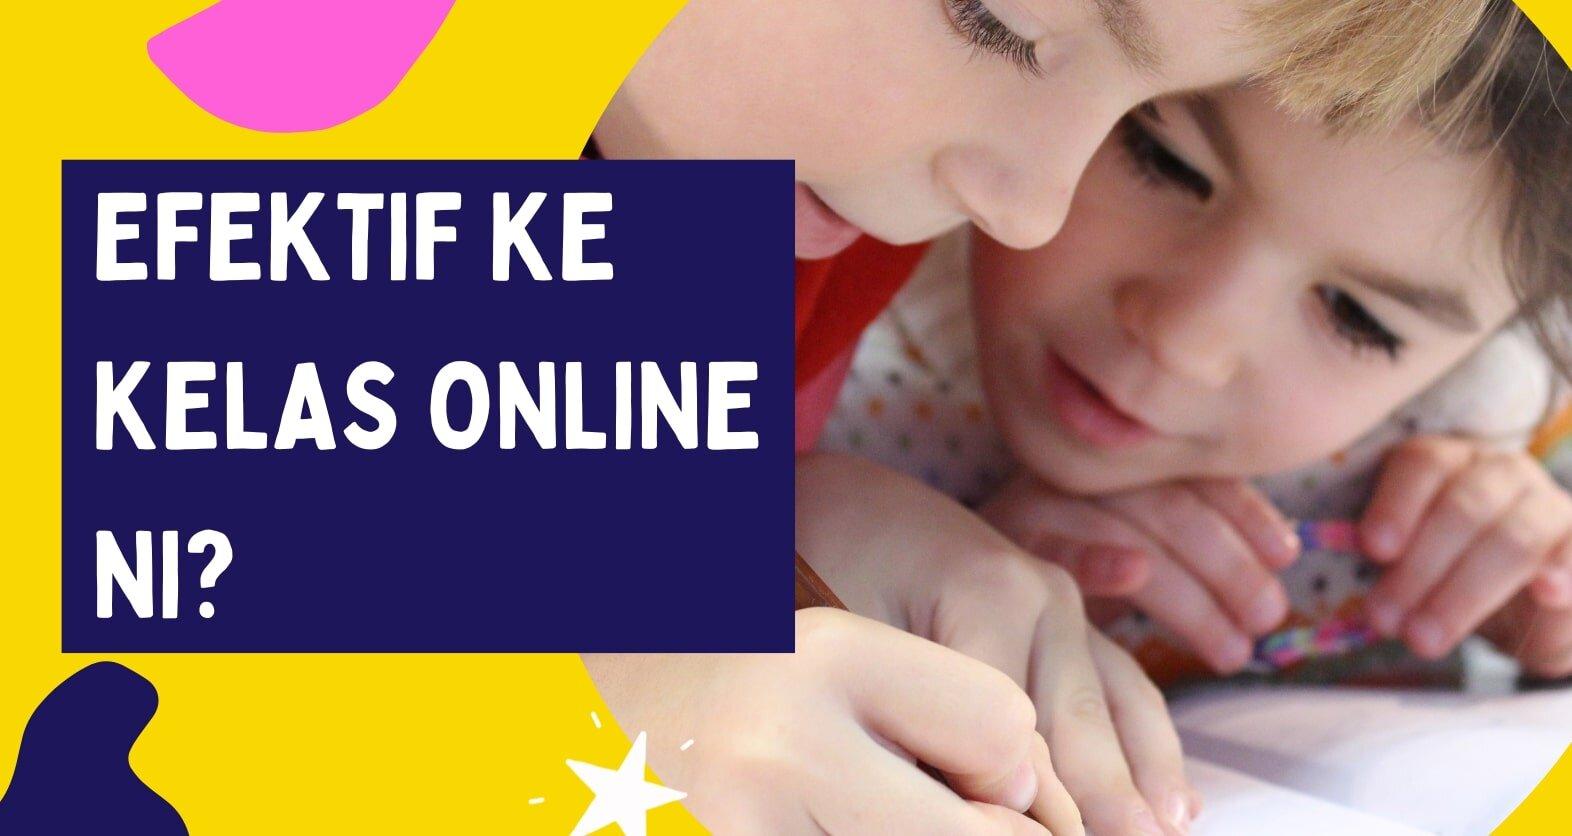 Efektif Ke Kelas Online Ni?